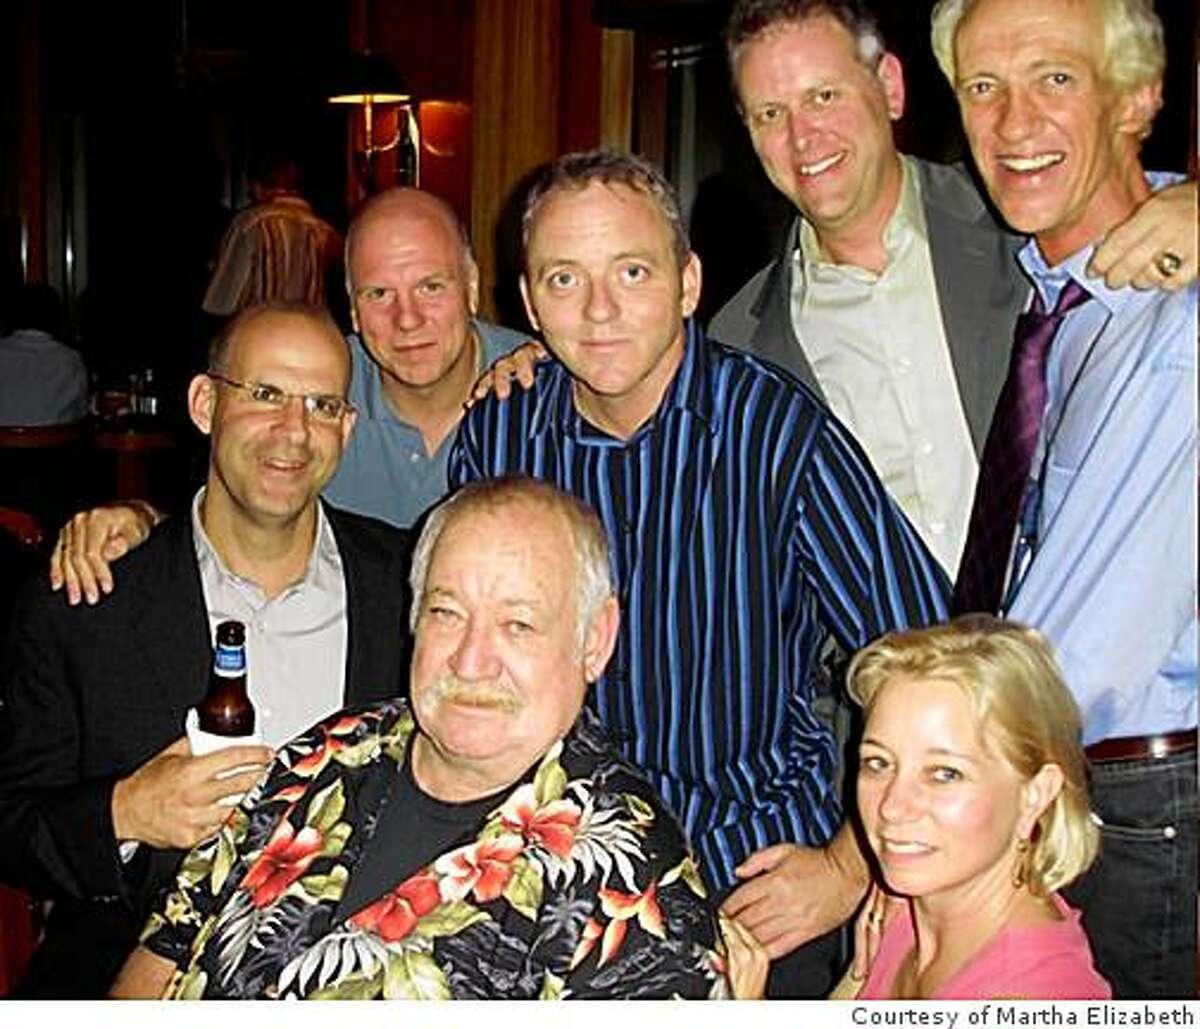 The King and his Court: James Crumley (in Hawaiian shirt) feted in a Toronto tavern by author/acolytes (l-r) Harlen Coben, Peter Robinson, Dennis Lehane, Eddie Muller, Laura Lippman, and Ken Bruen. / Courtesy of Martha Elizabeth